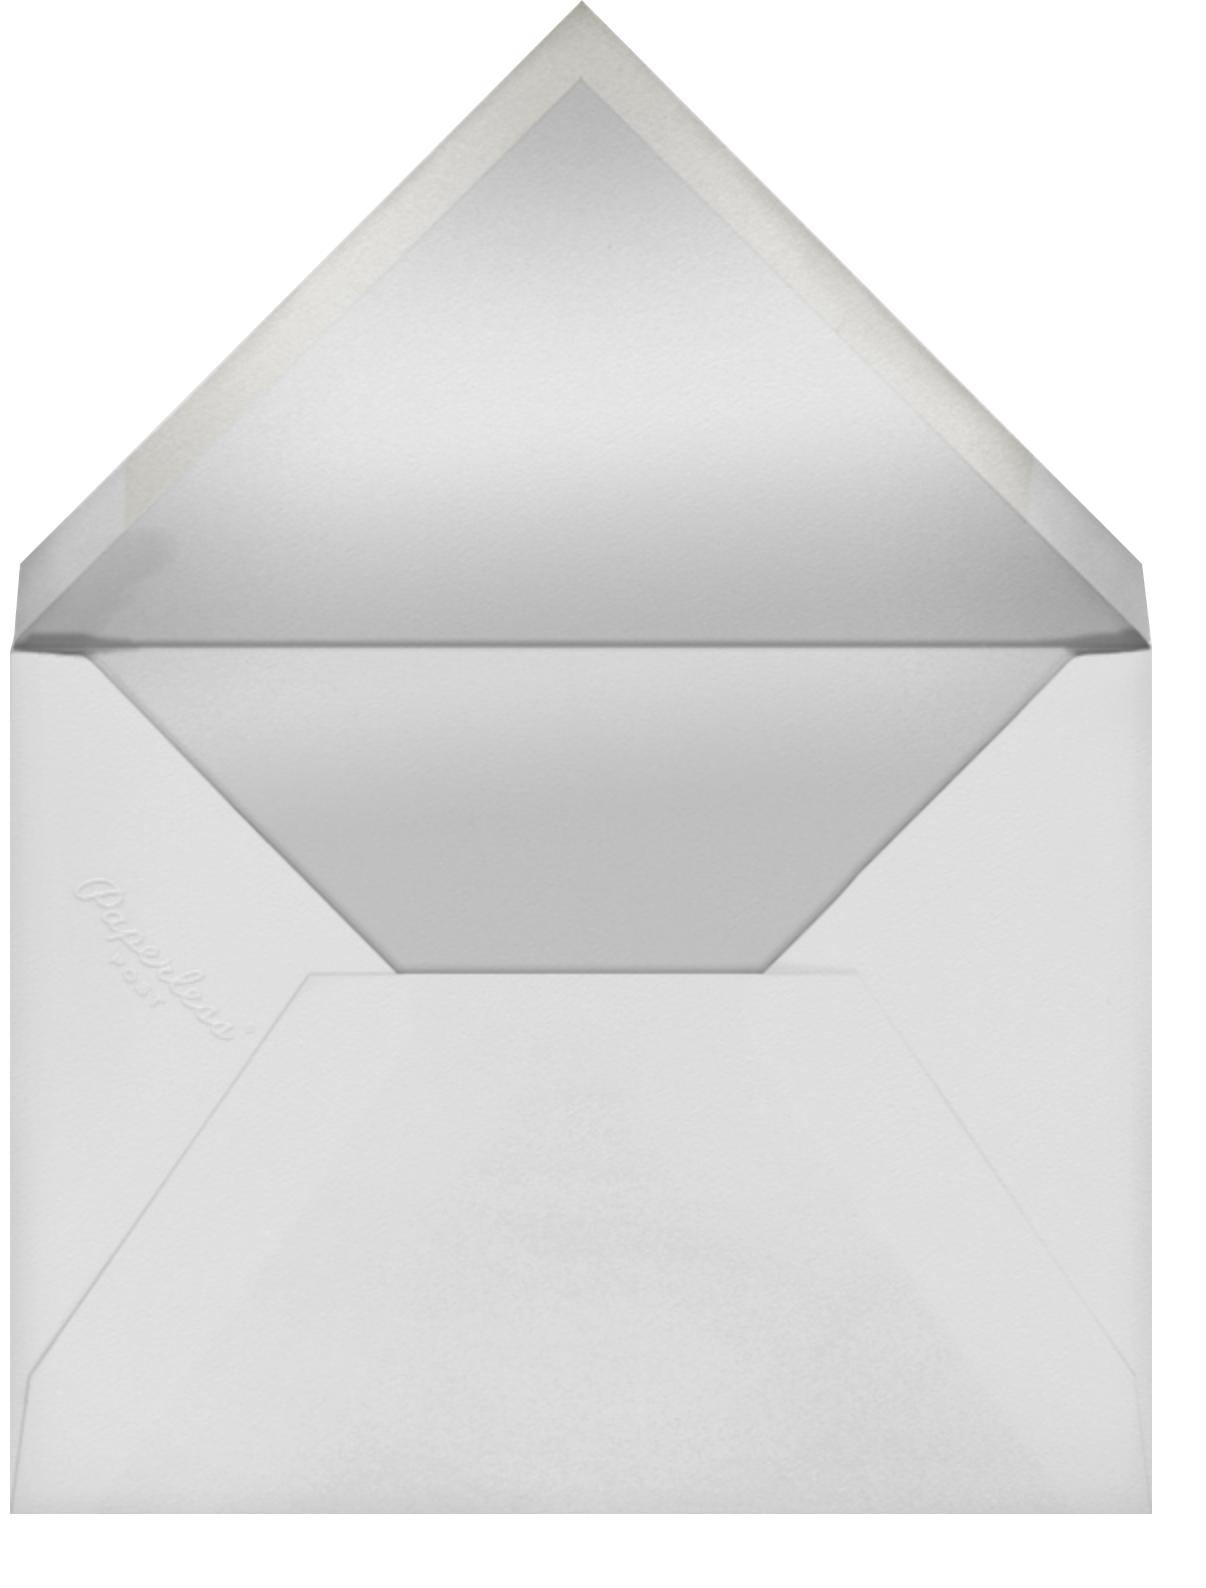 Vineyard I (Menu) - Burgundy - Paperless Post - Menus - envelope back